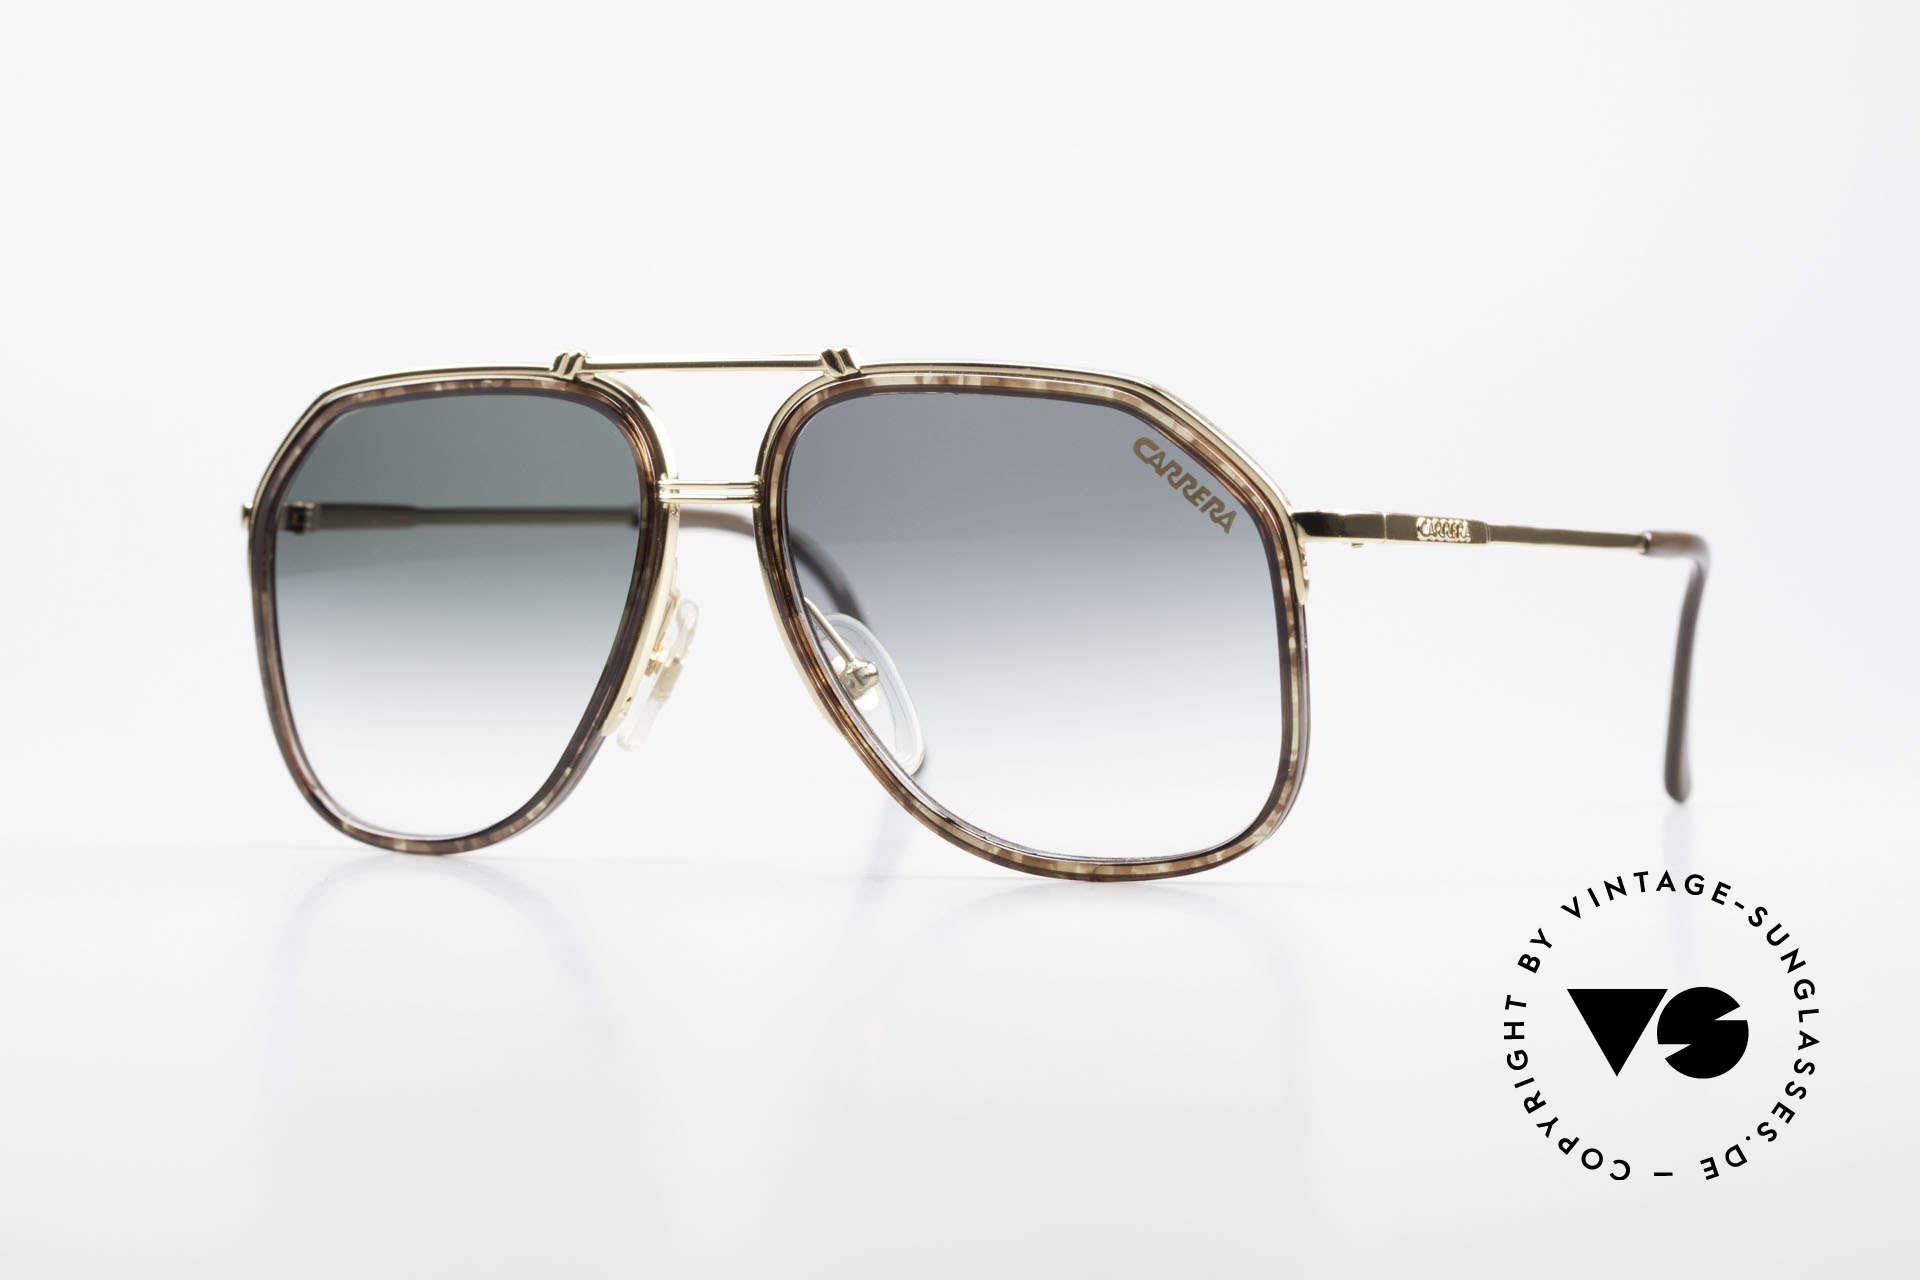 Carrera 5370 Classic Vintage Sunglasses, noble vintage 1990's designer glasses by Carrera, Made for Men